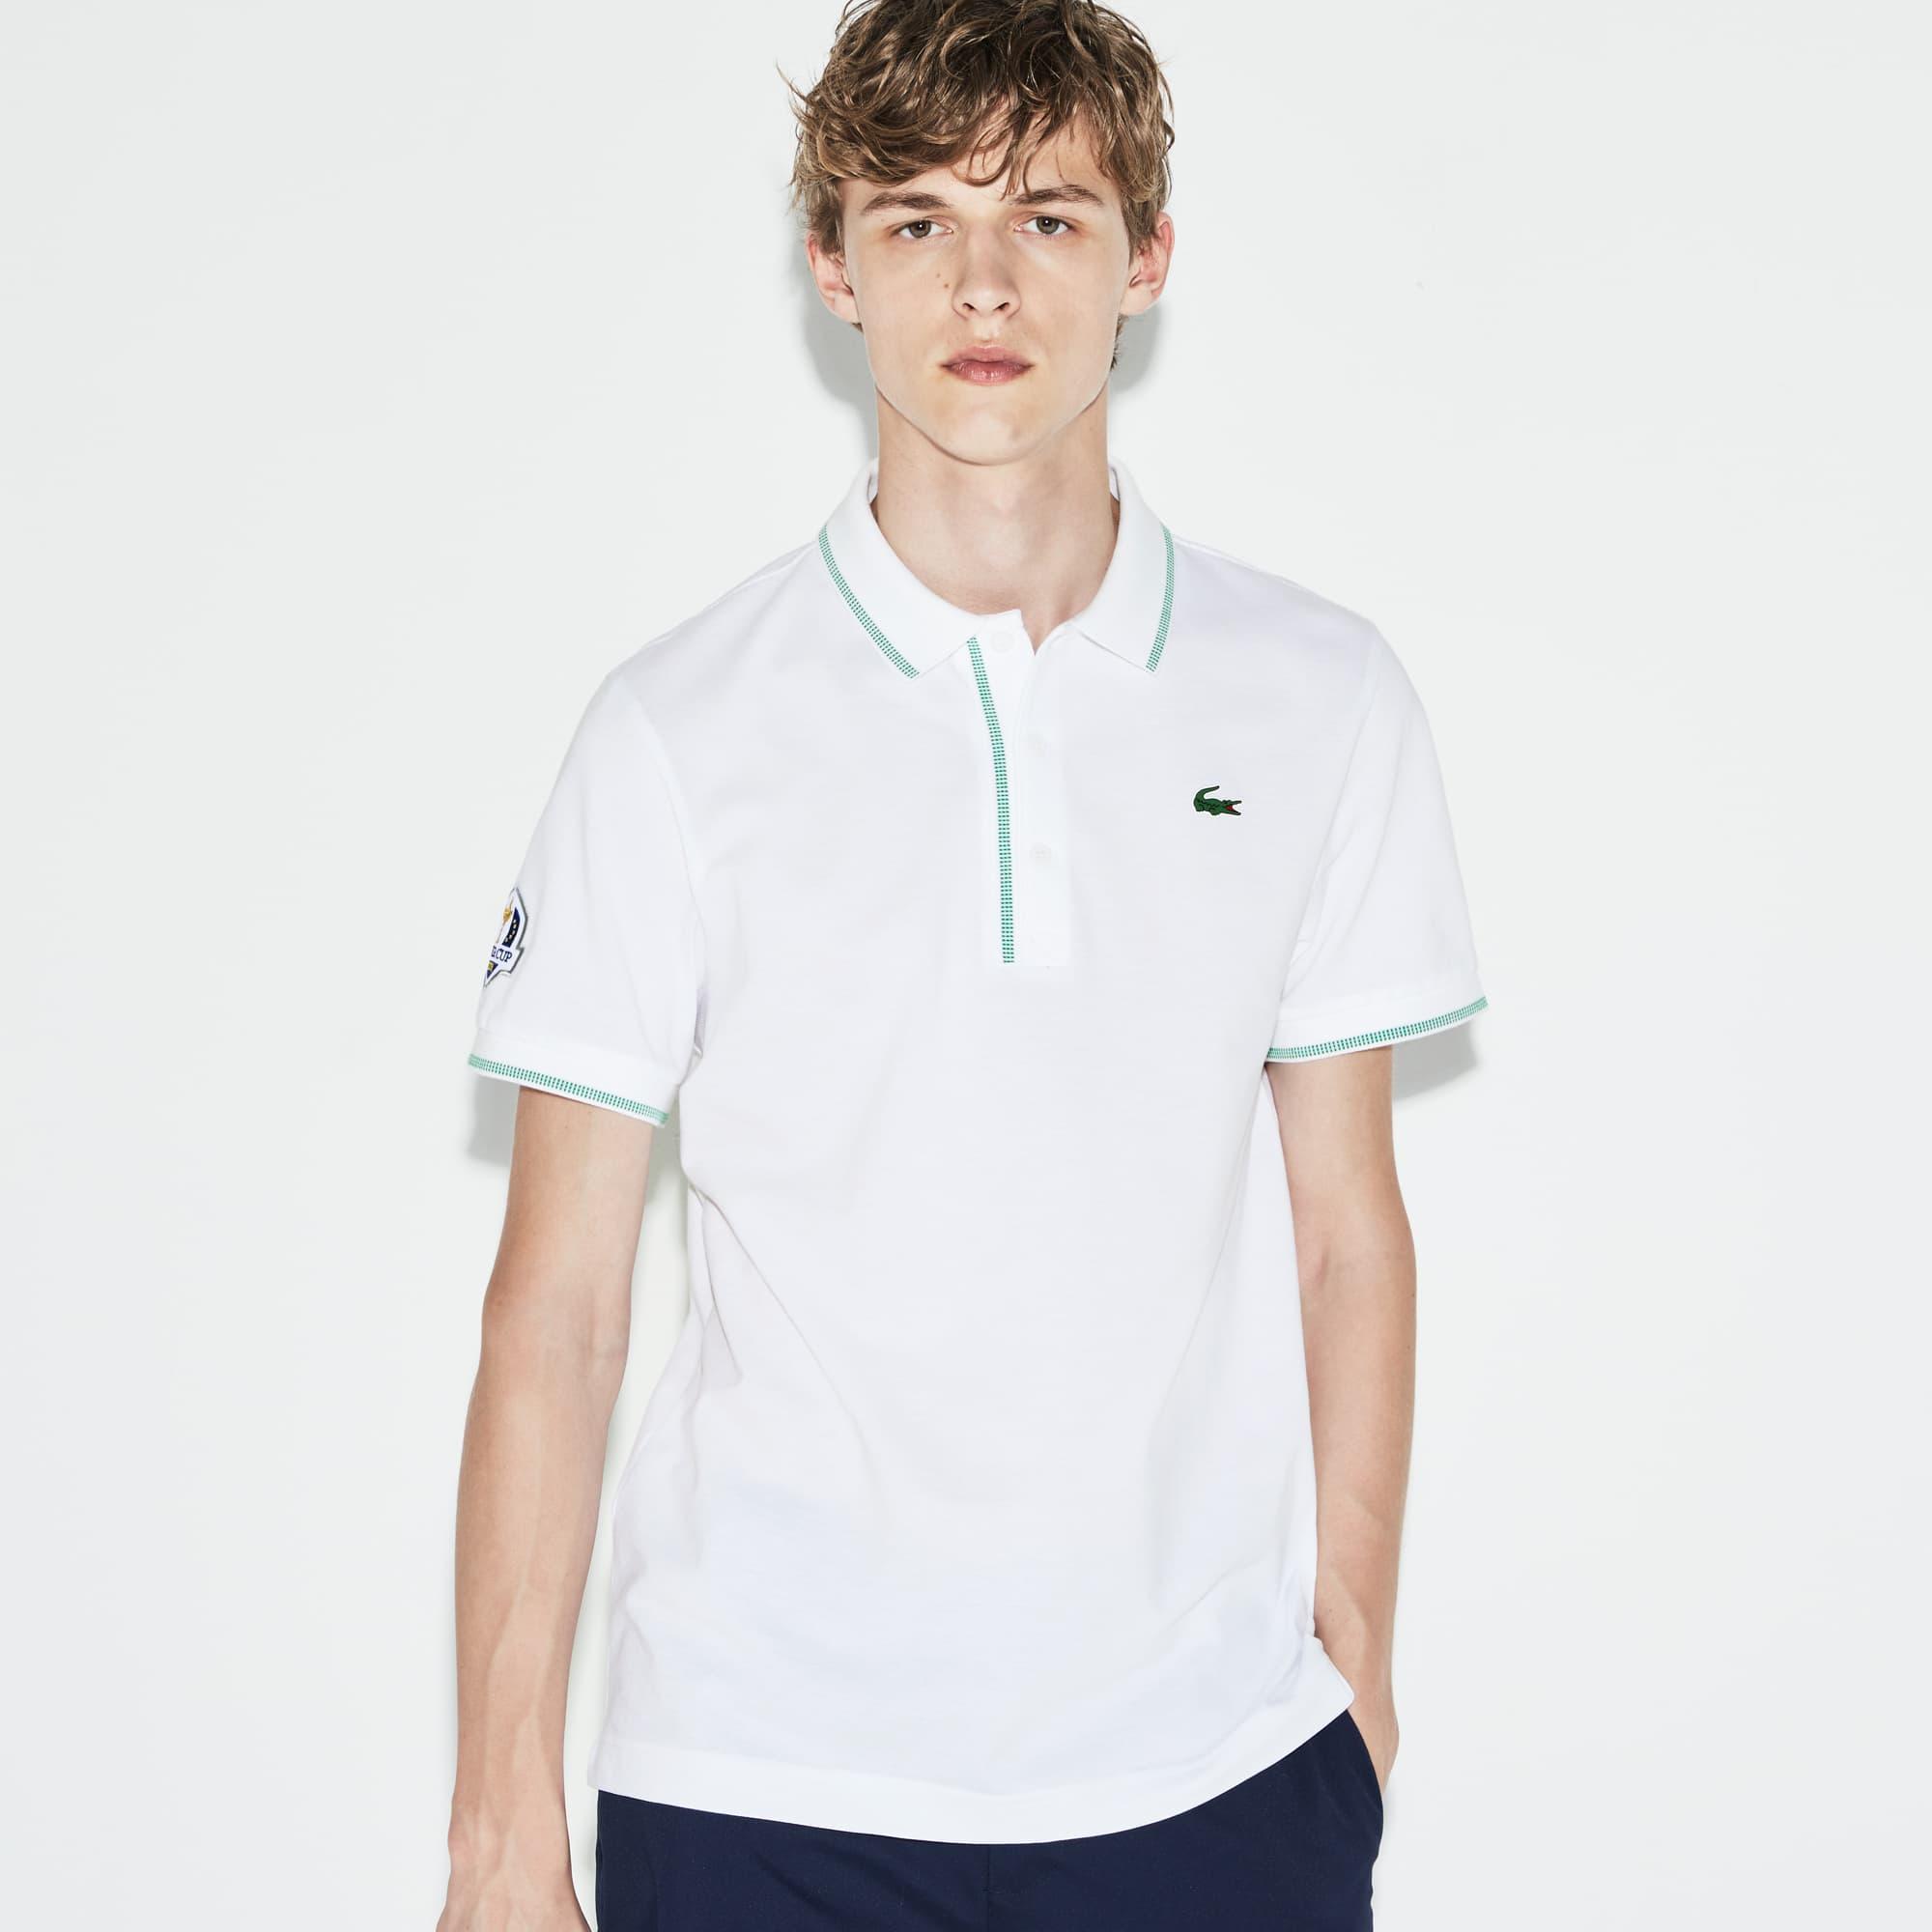 Lacoste - Herren LACOSTE SPORT Ryder Cup Edition Golf Poloshirt mit Paspeln - 5